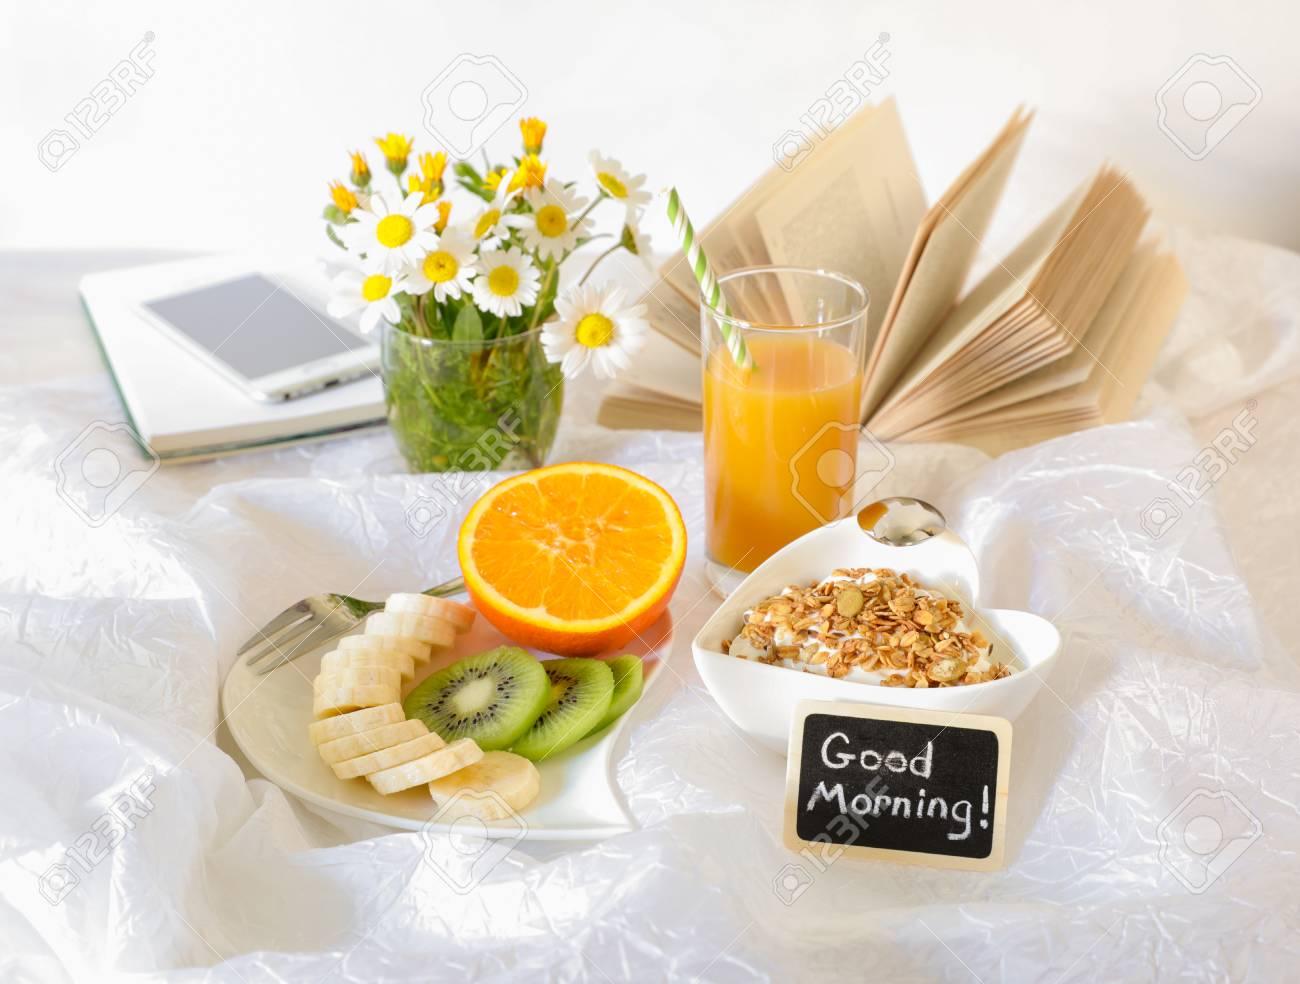 Good Morning And Healthy Breakfast Concept Fruits Banana Kiwi